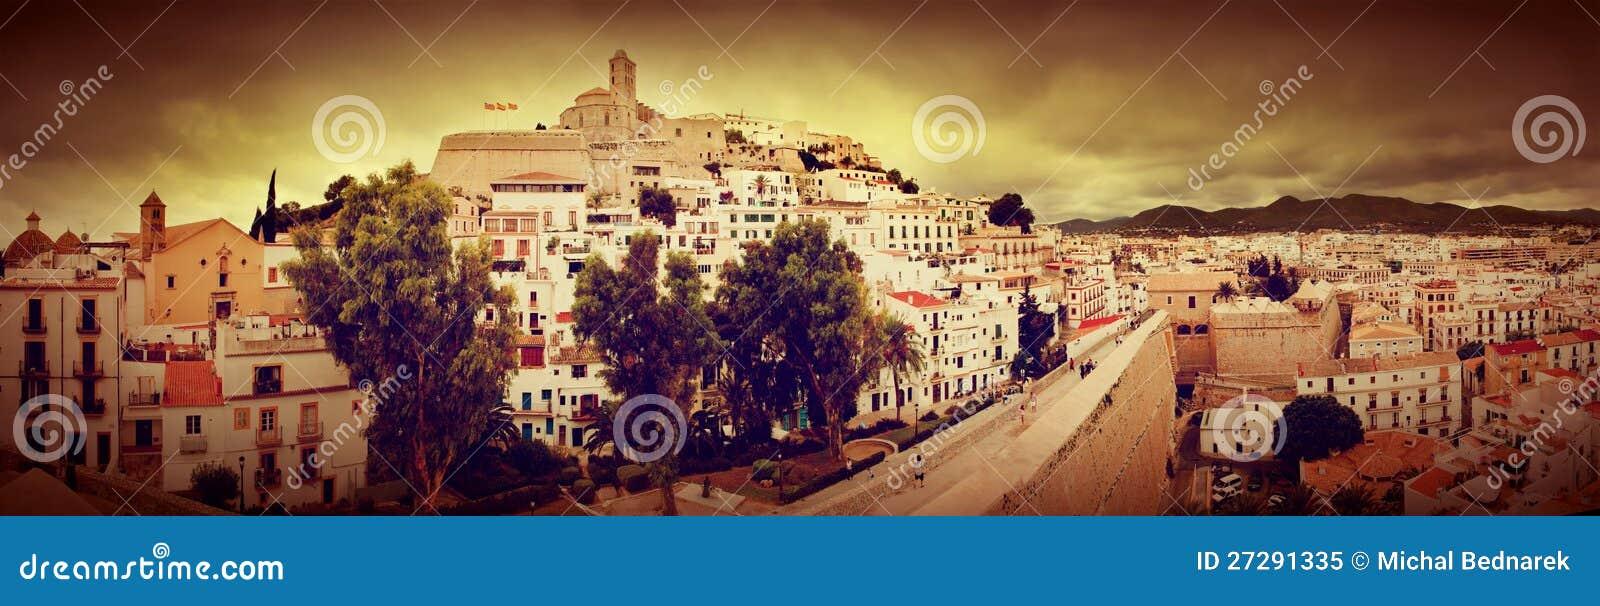 Panorama stary miasto Ibiza, Hiszpania